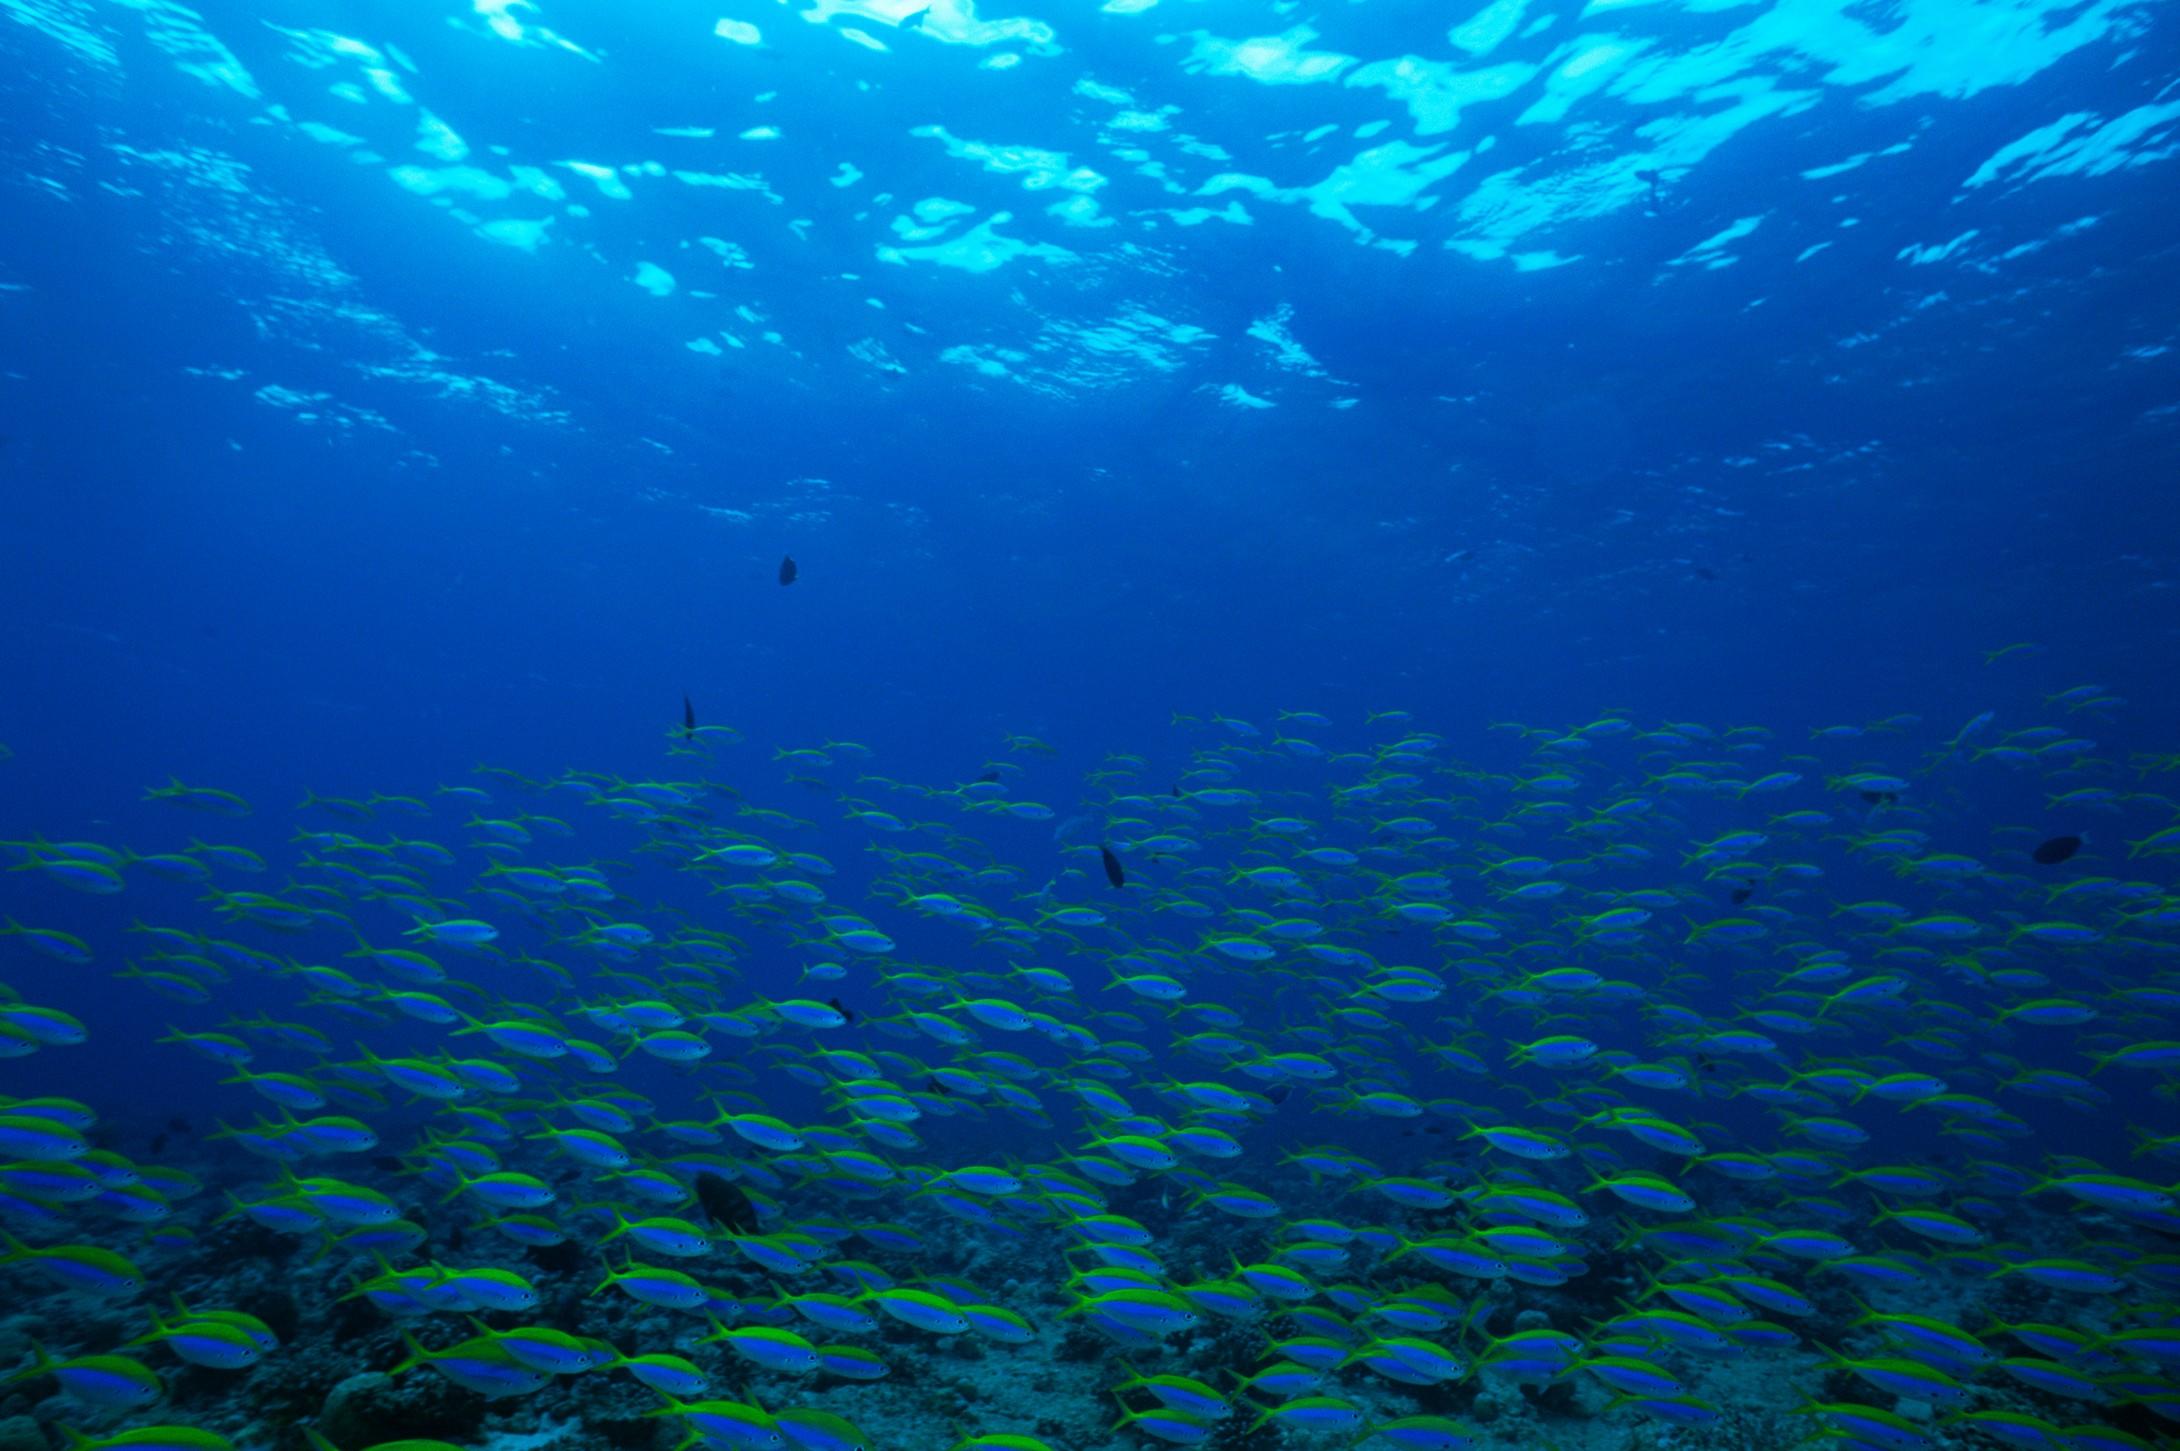 design 船图片简笔画大图图片展示_船图片简笔画大图相关  深海海底